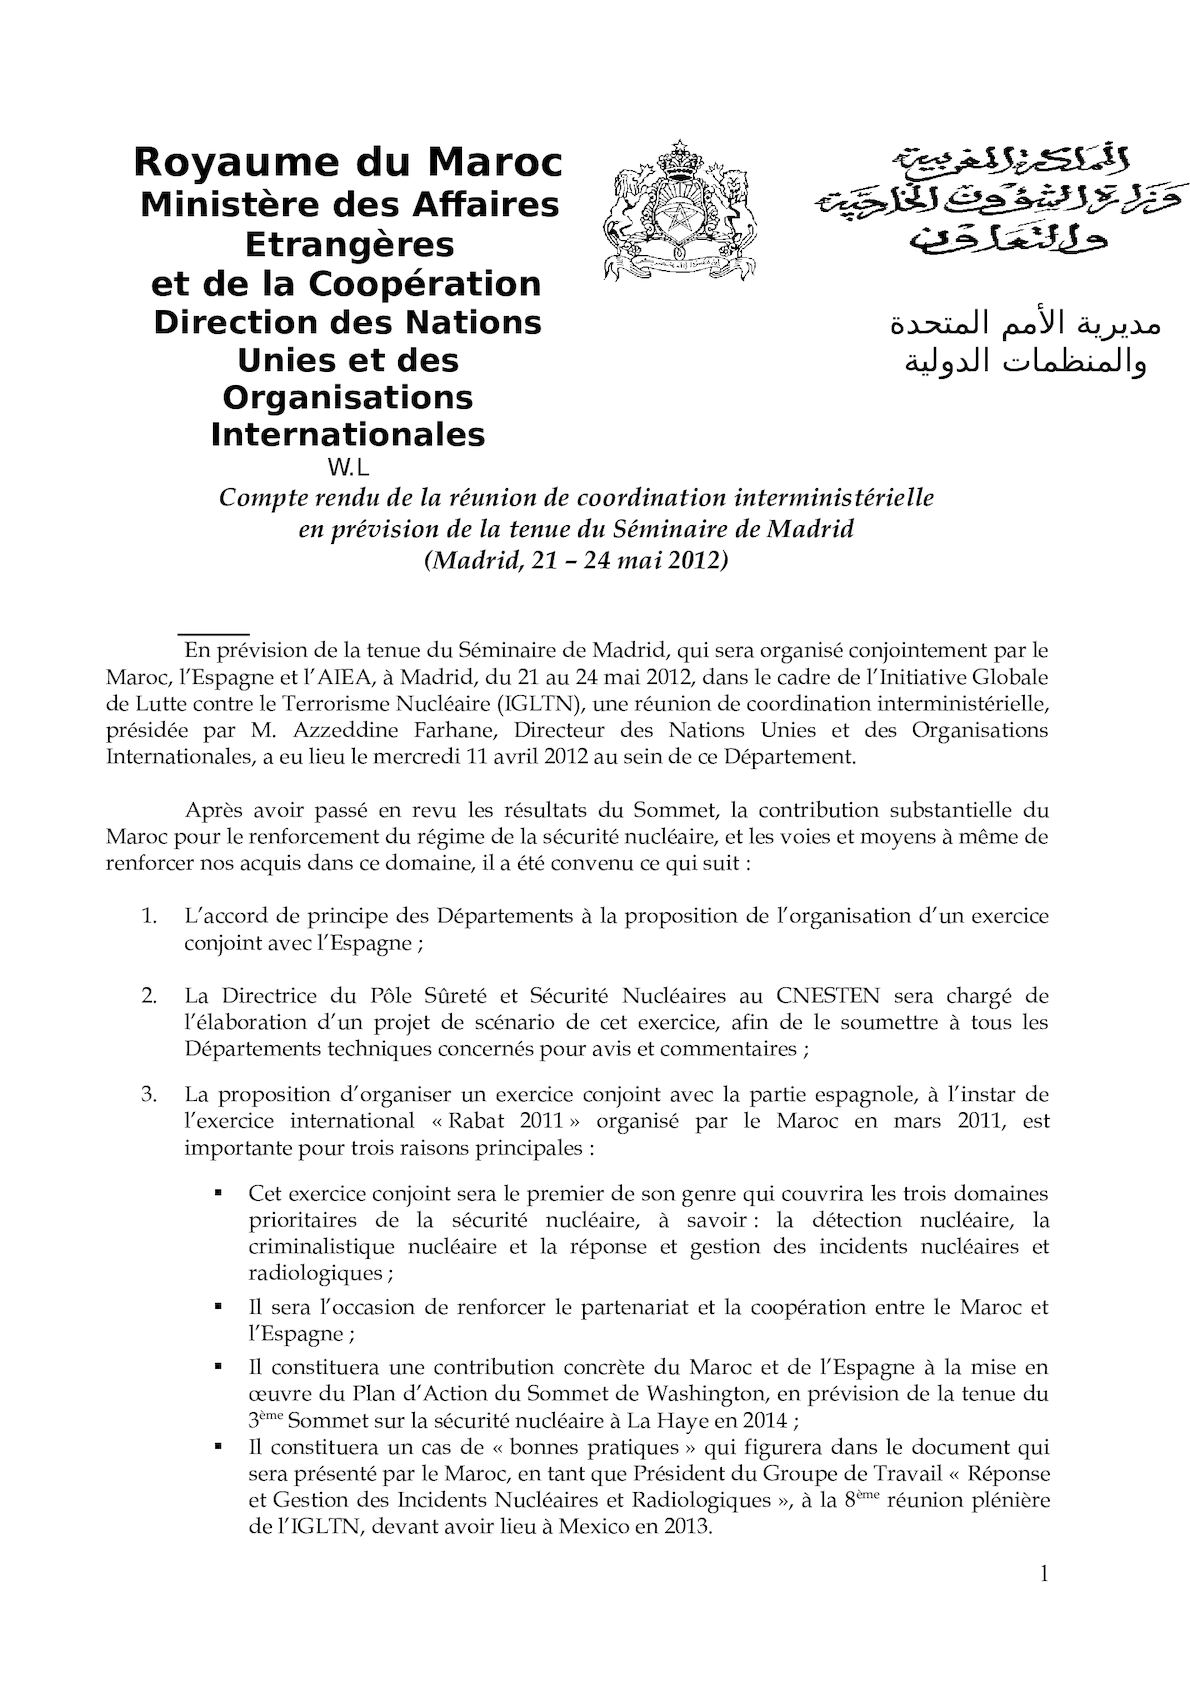 Compte Rendu Réunion Coordination Interministérille